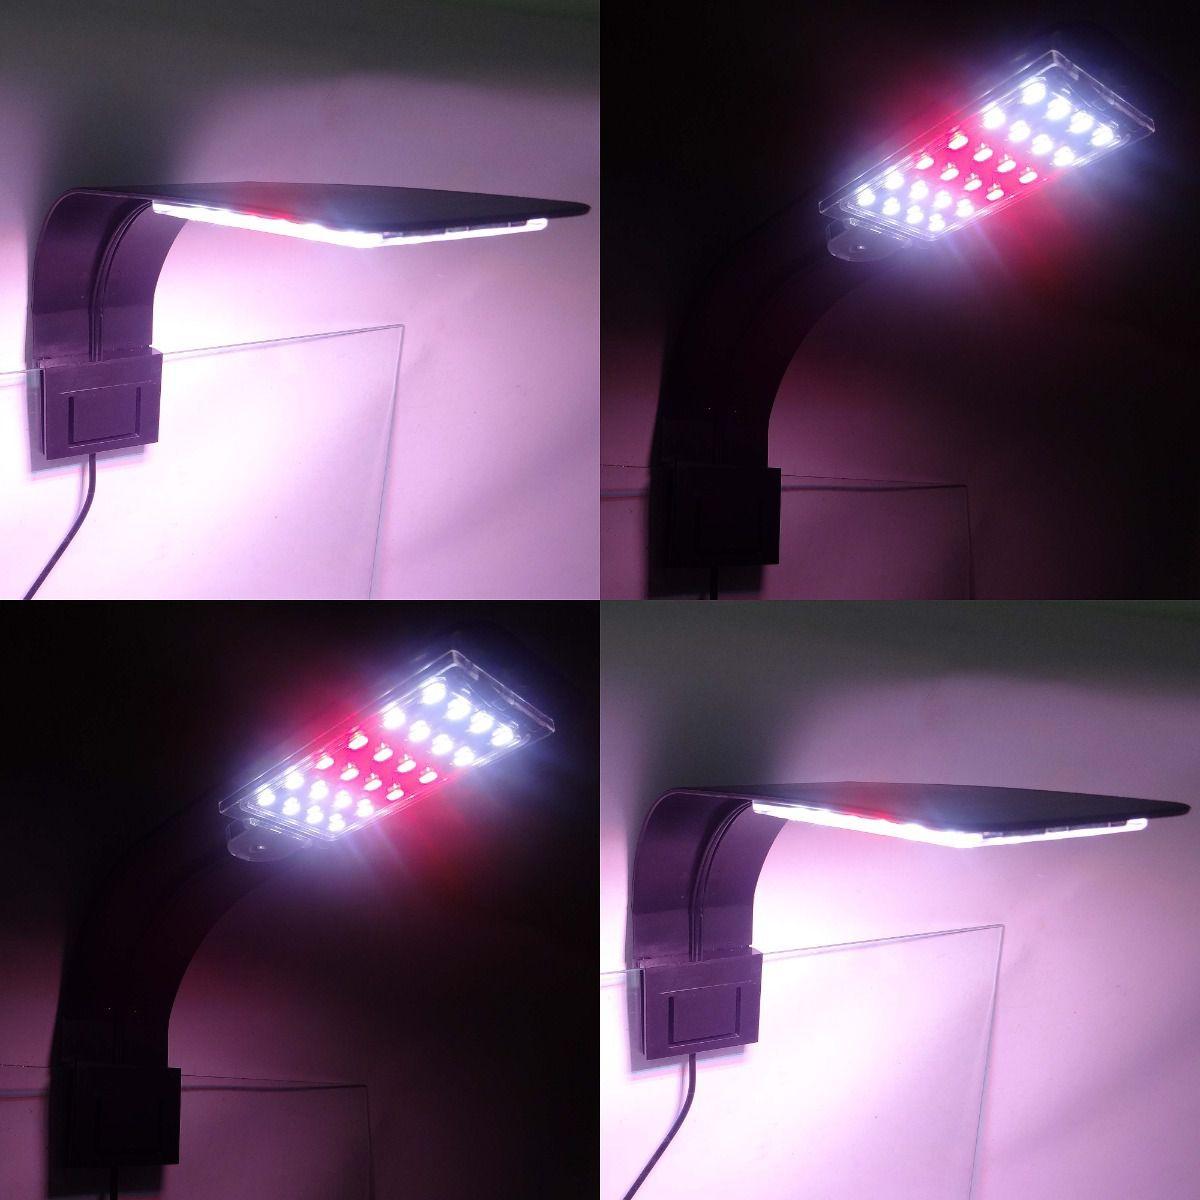 Luminaria Led Soma X5 - 10w Led Branco/Vermelho